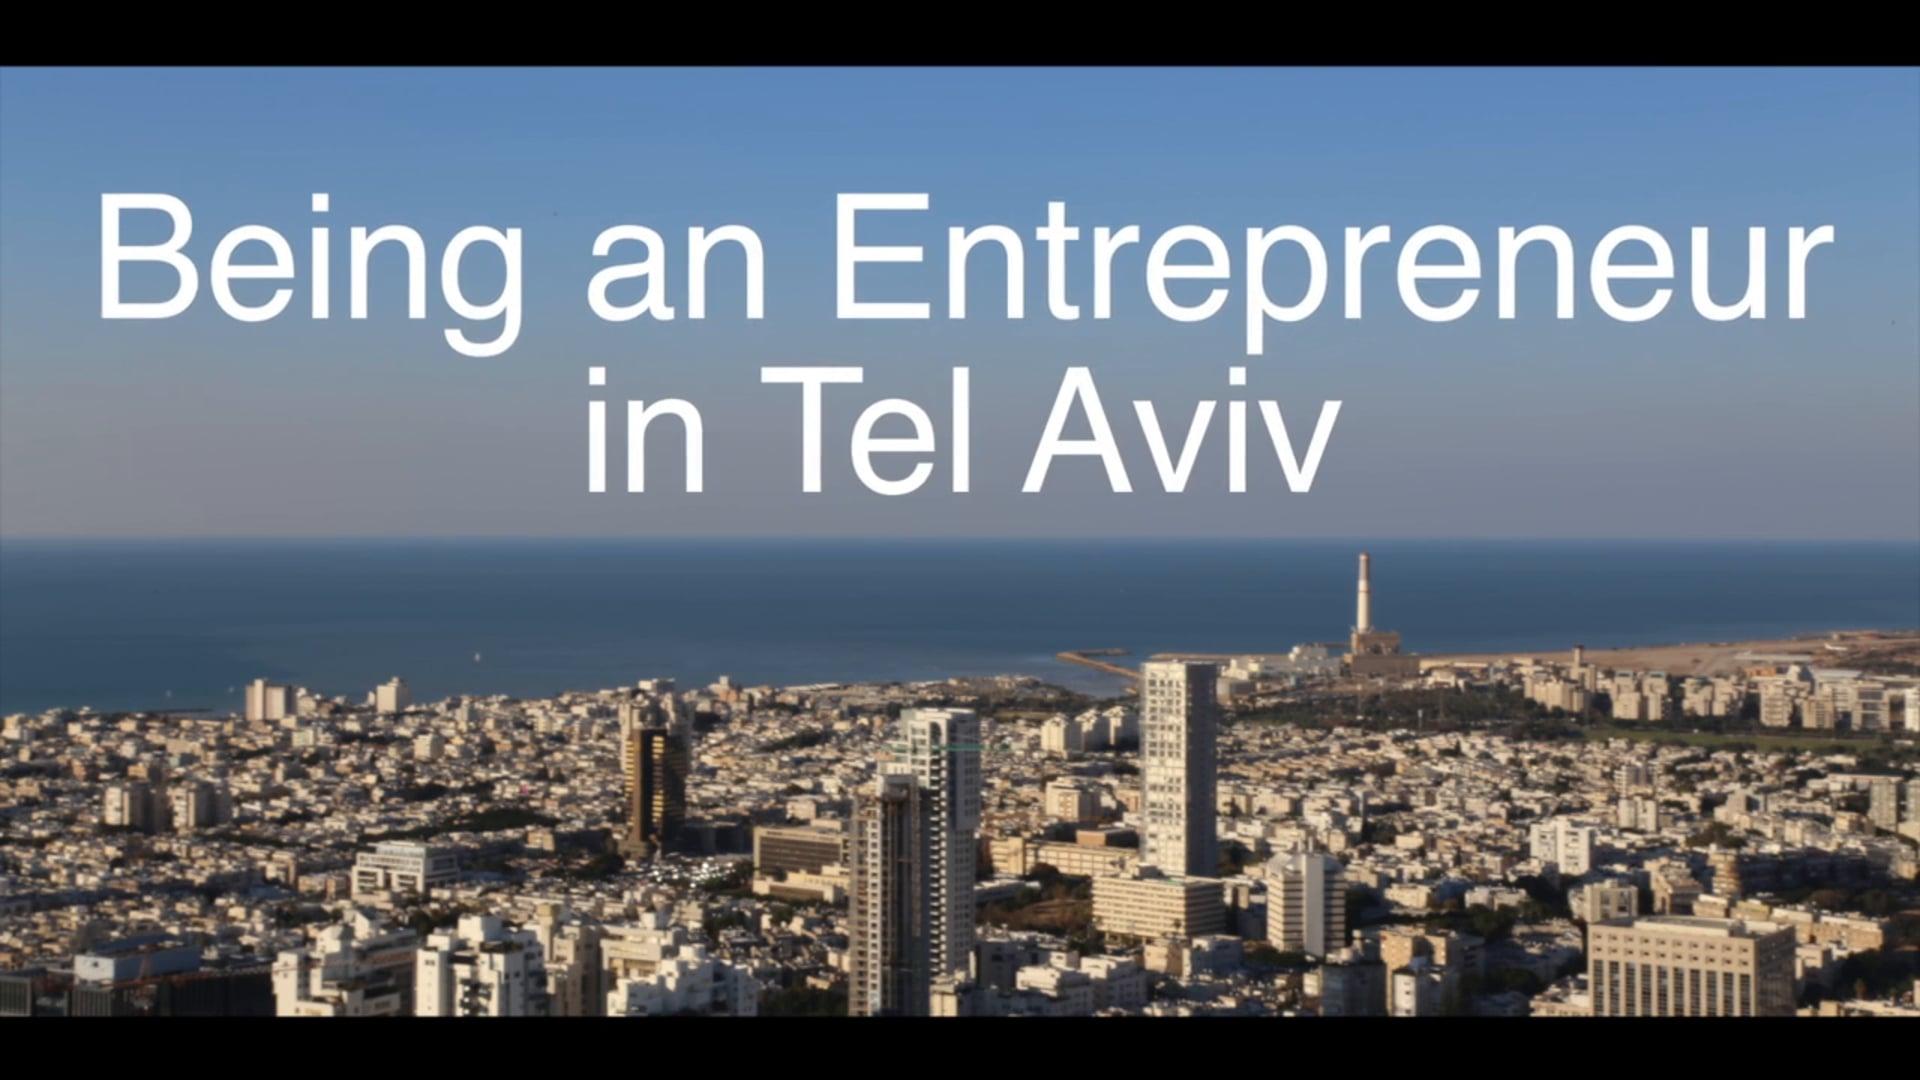 Tel Aviv's Startup Ecosystem